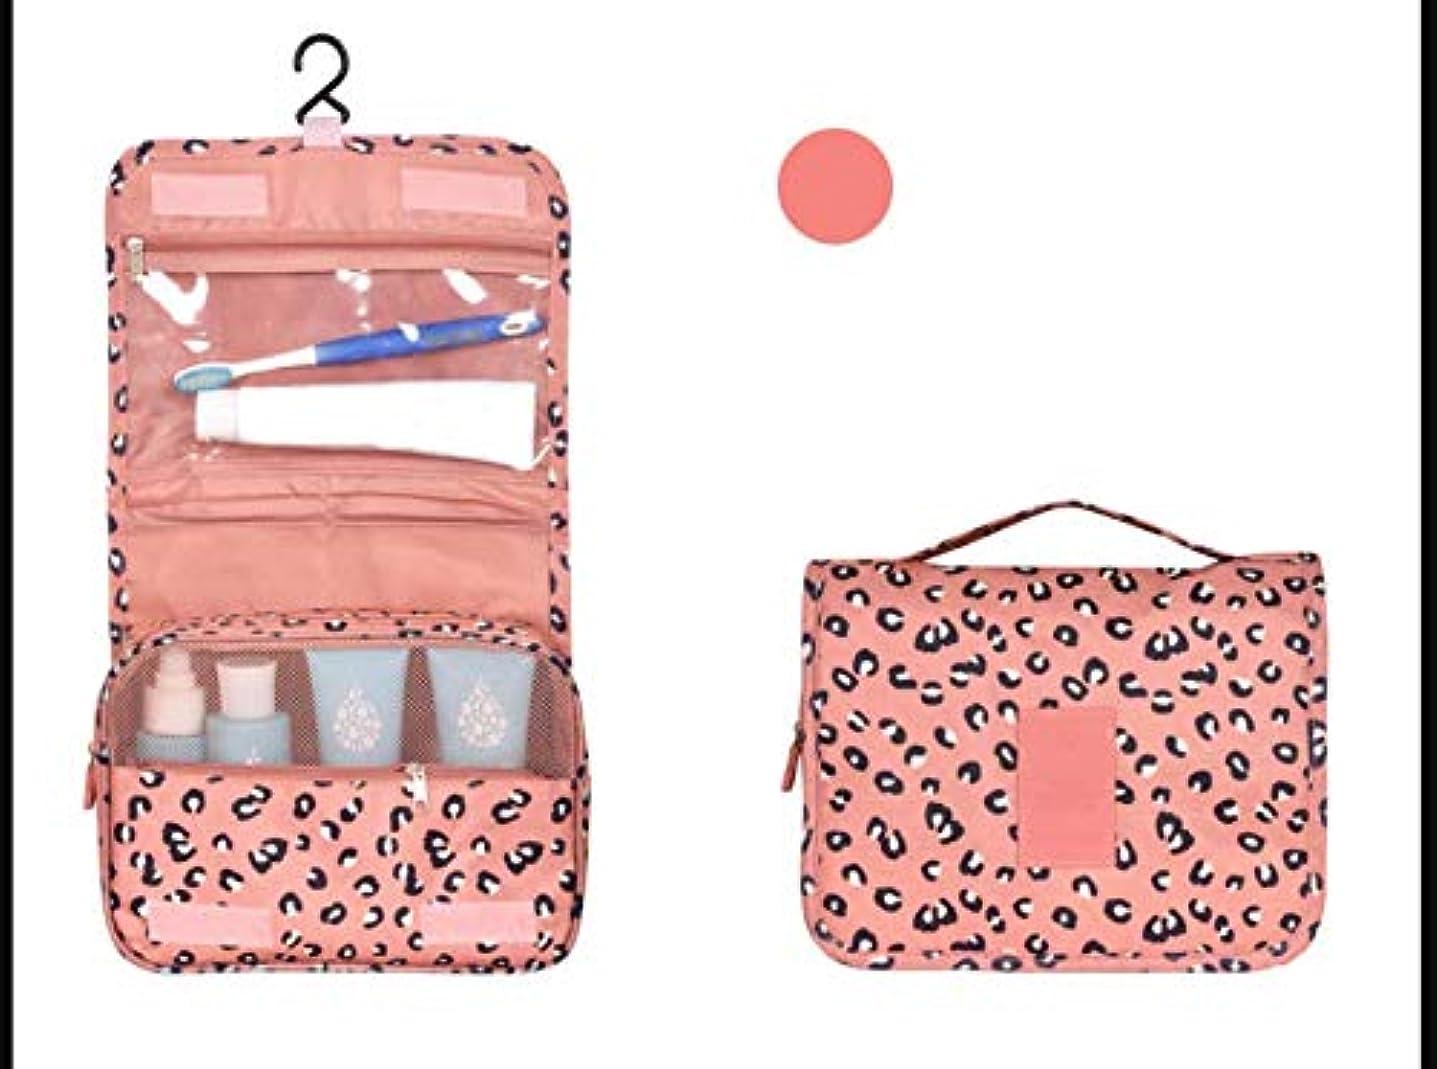 RICISUNG ハンドバッグ、クリーニング用品、旅行用バッグ、バスバッグ、化粧バッグ、ジッパー、化粧バッグ、ペンダント、便利なアイテム、小物、ギフト